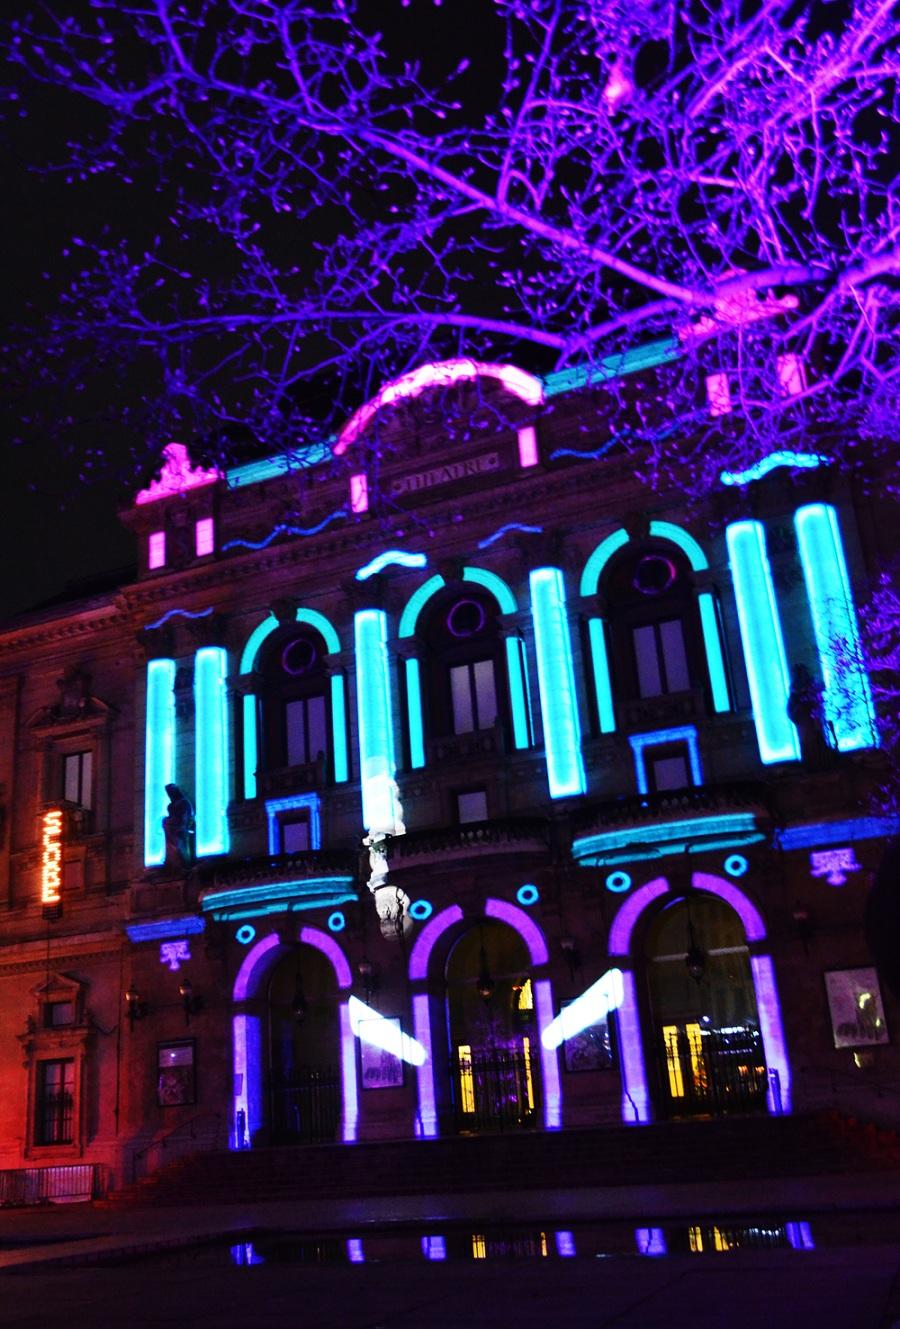 Lyon Festival Of Light - Town Hall